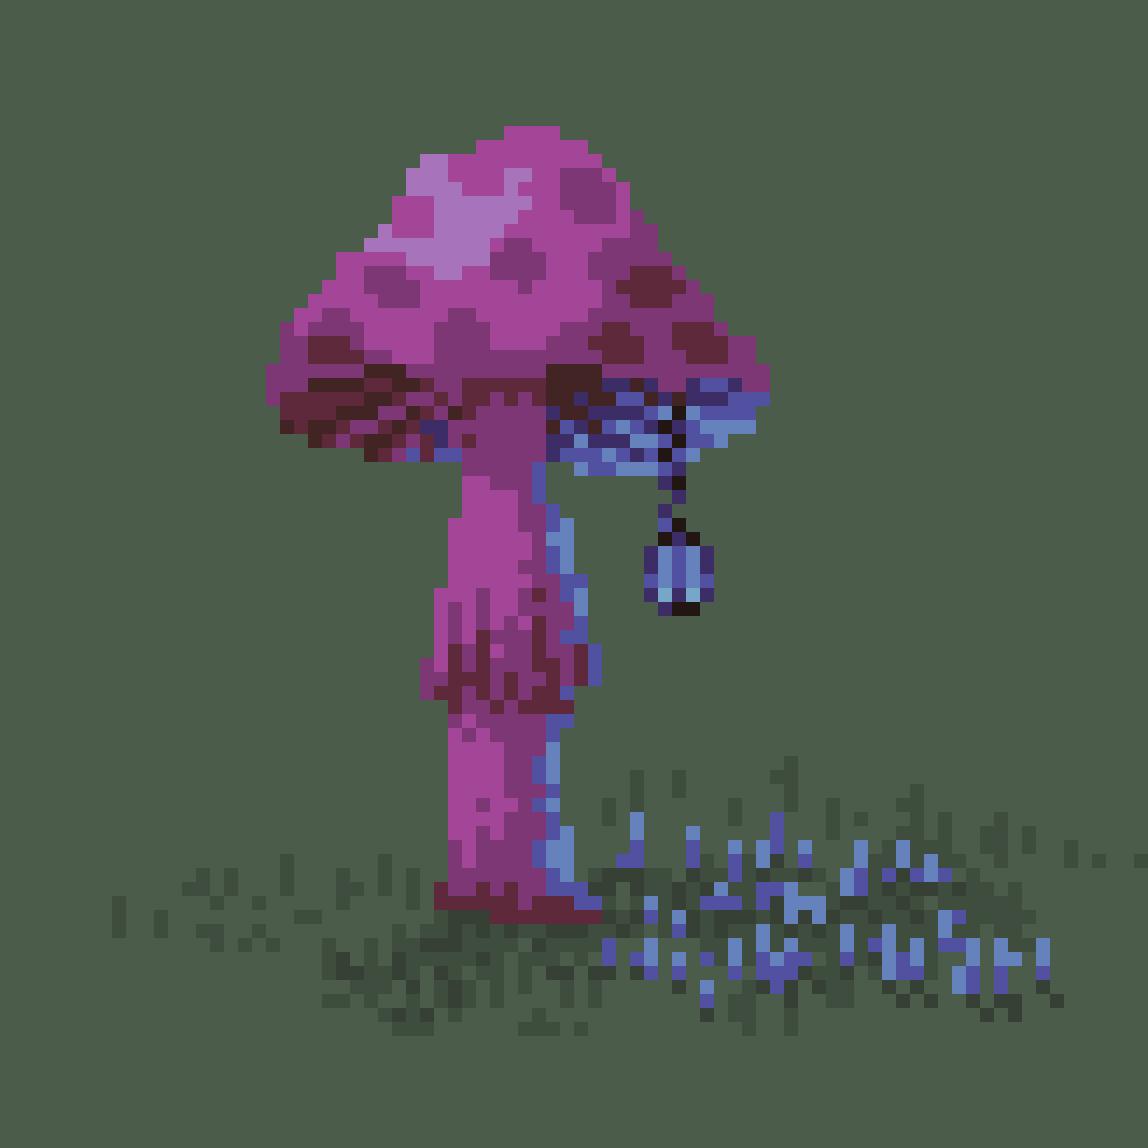 main-image-Mushroom  by 8-bit-adventure